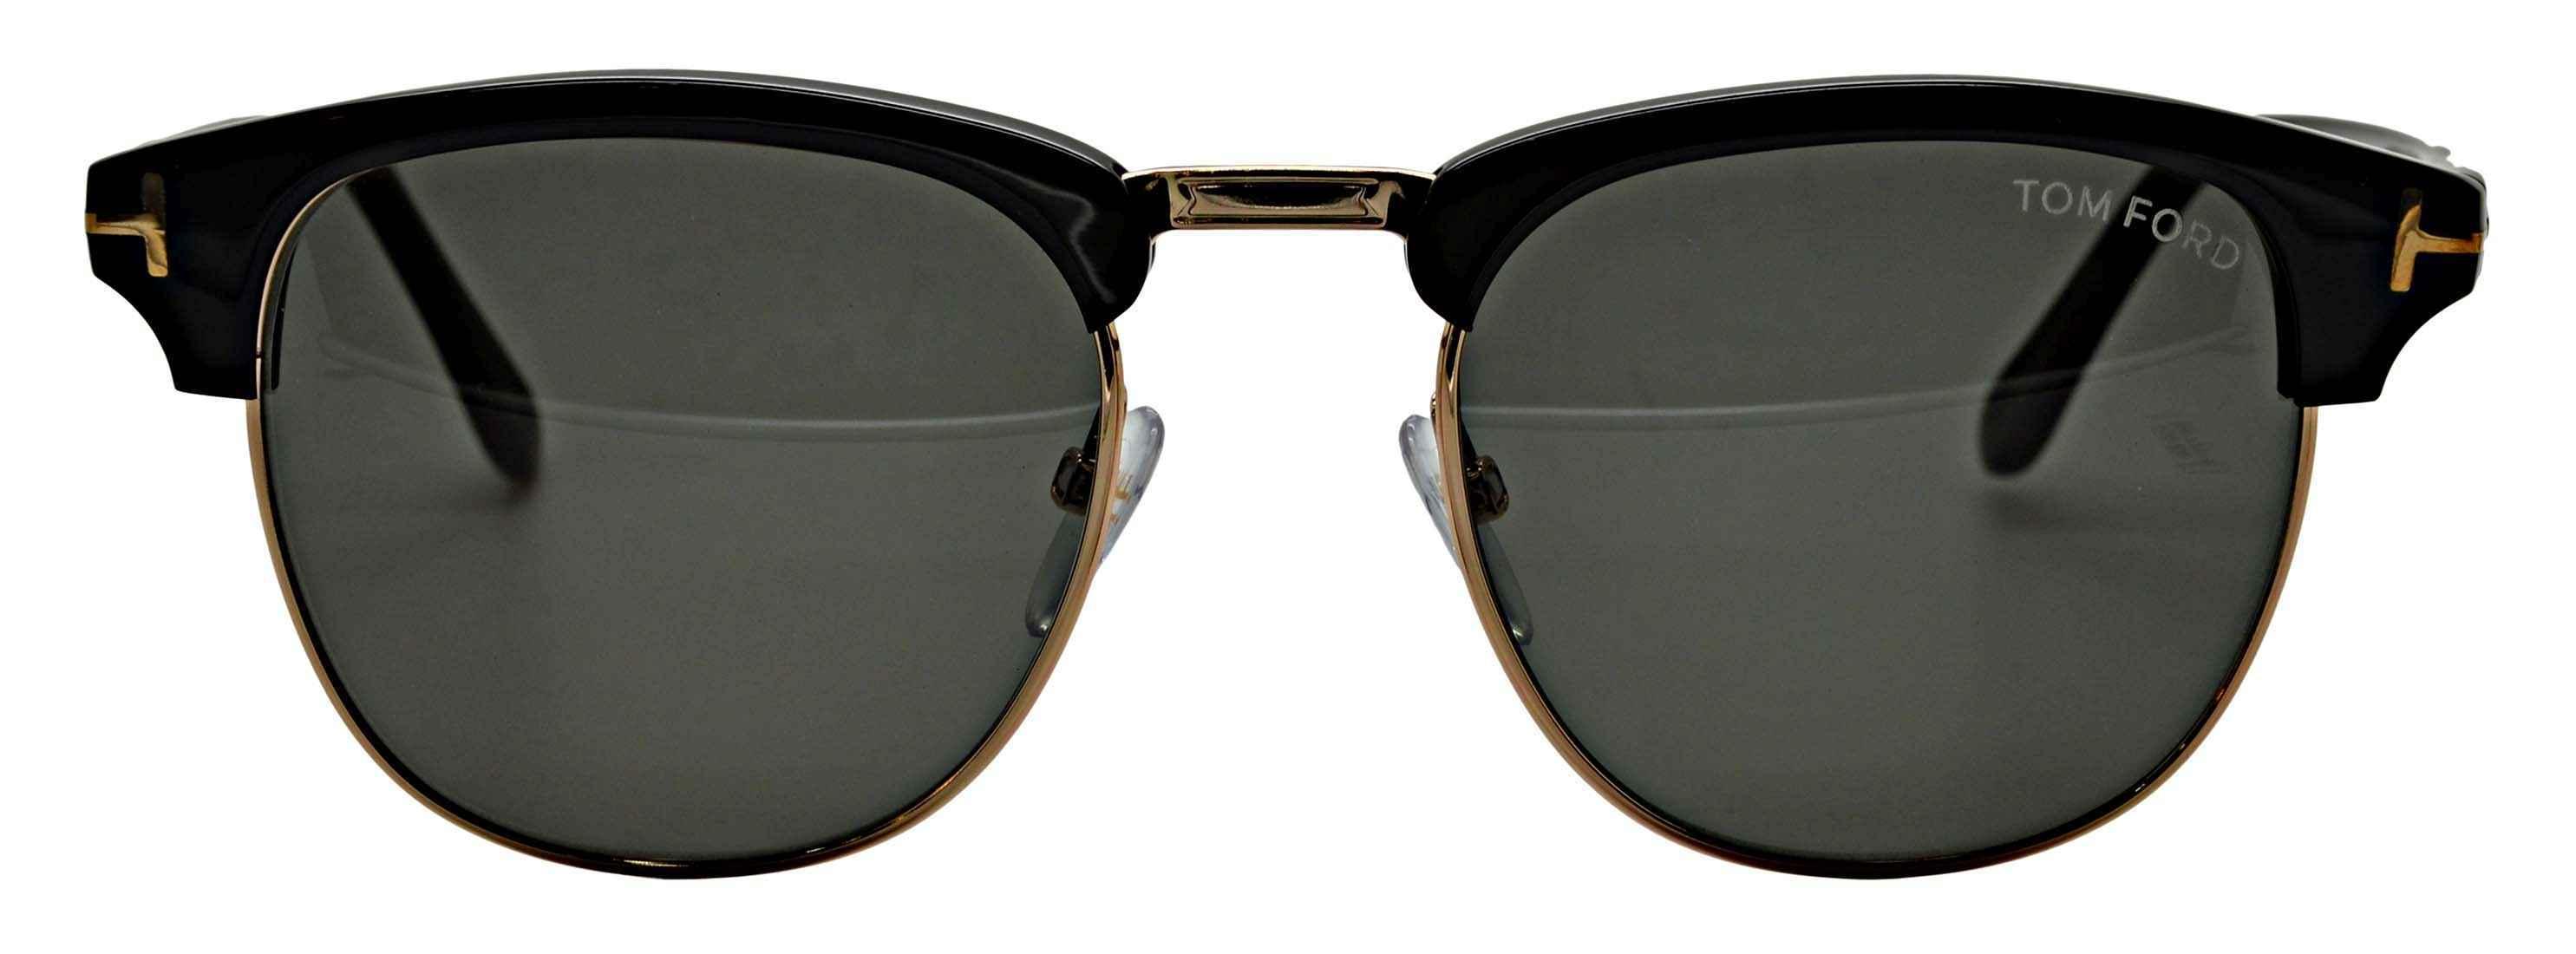 Tom Ford Sunglasses 248 5n 2 2970x1100